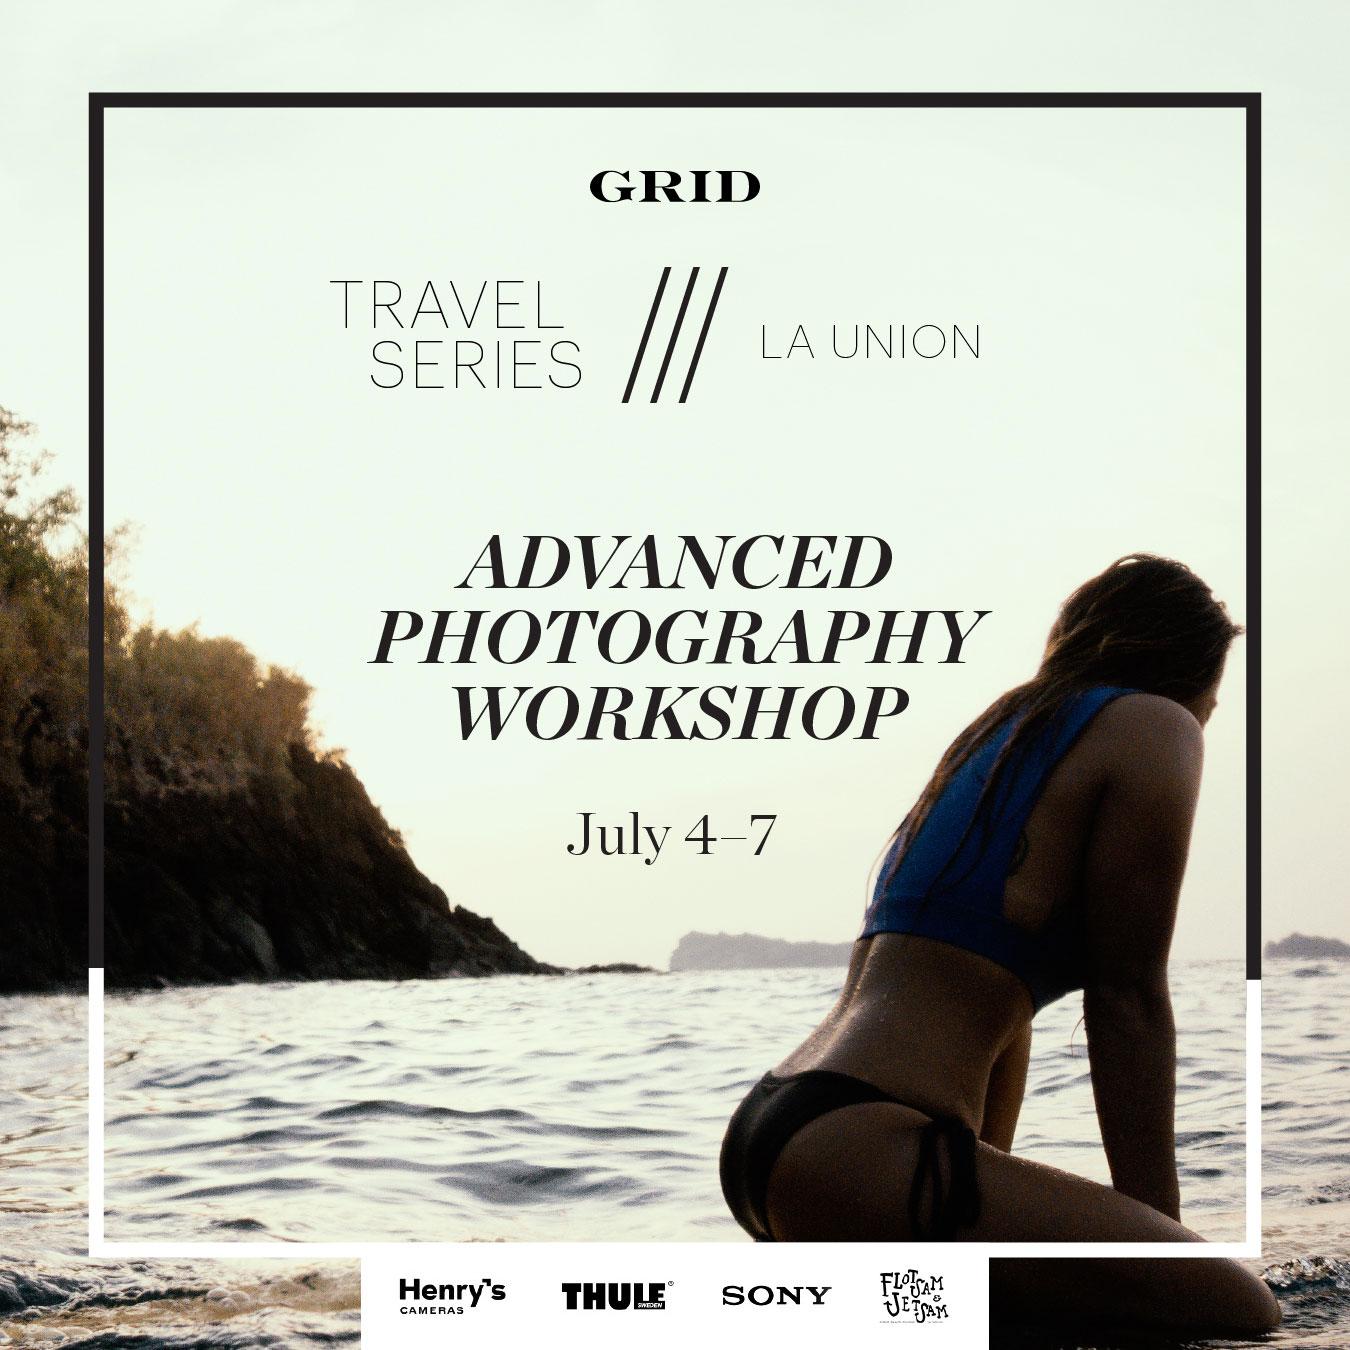 GRID Travel Series III: La Union, Photography Workshop